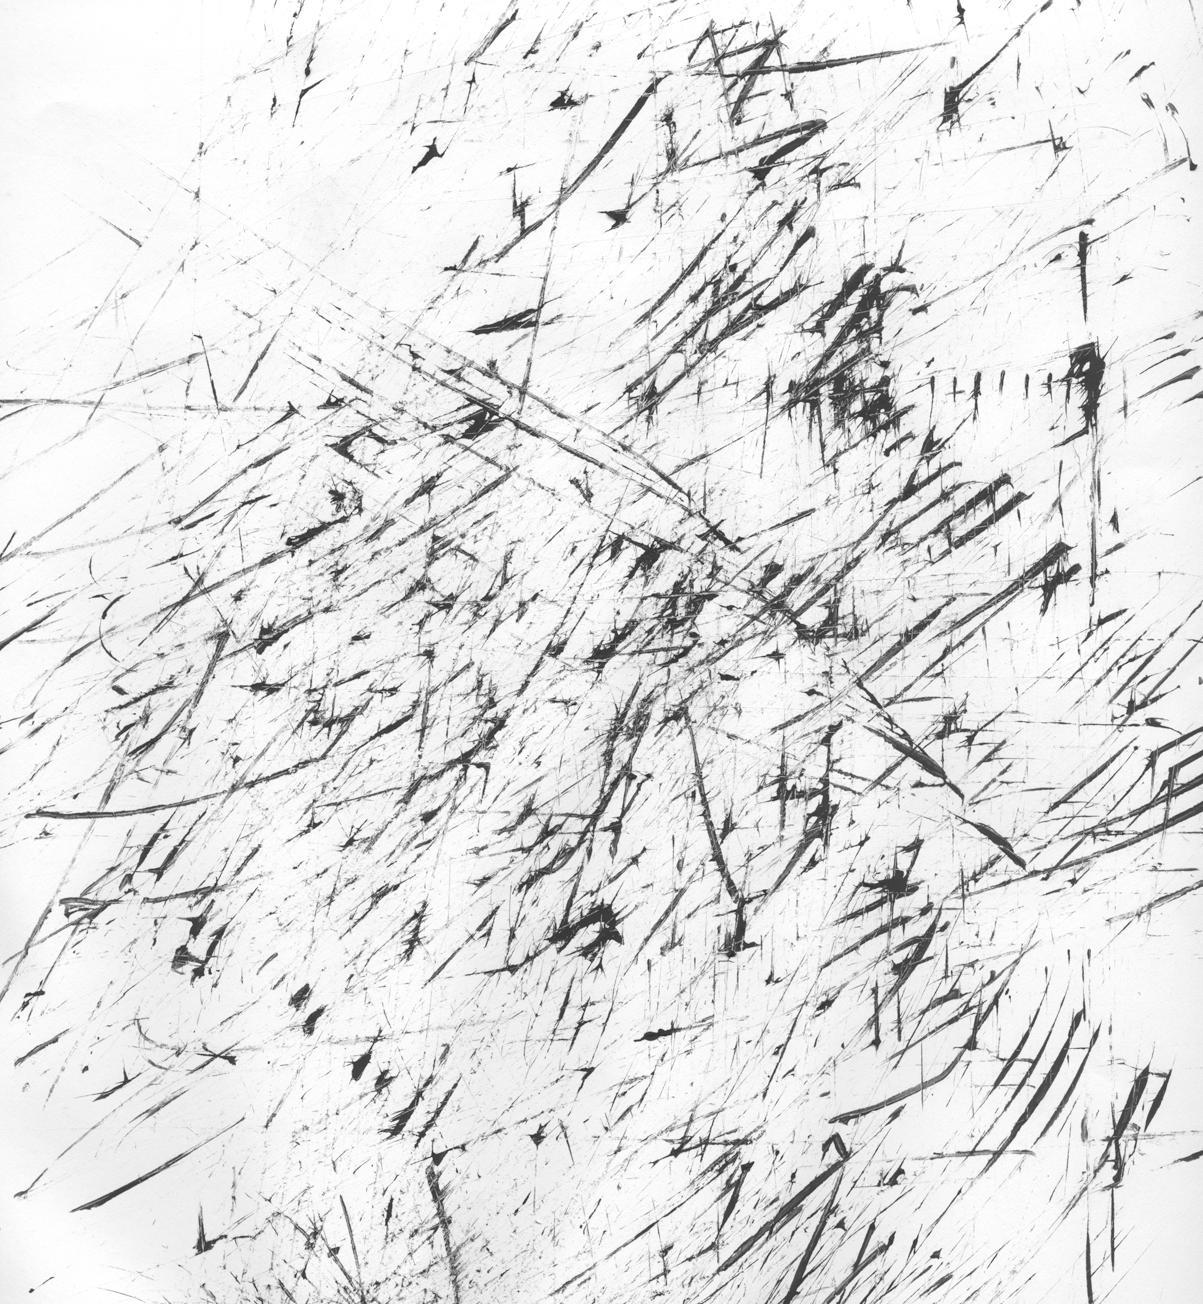 Texture 01 by Wu-KillahD